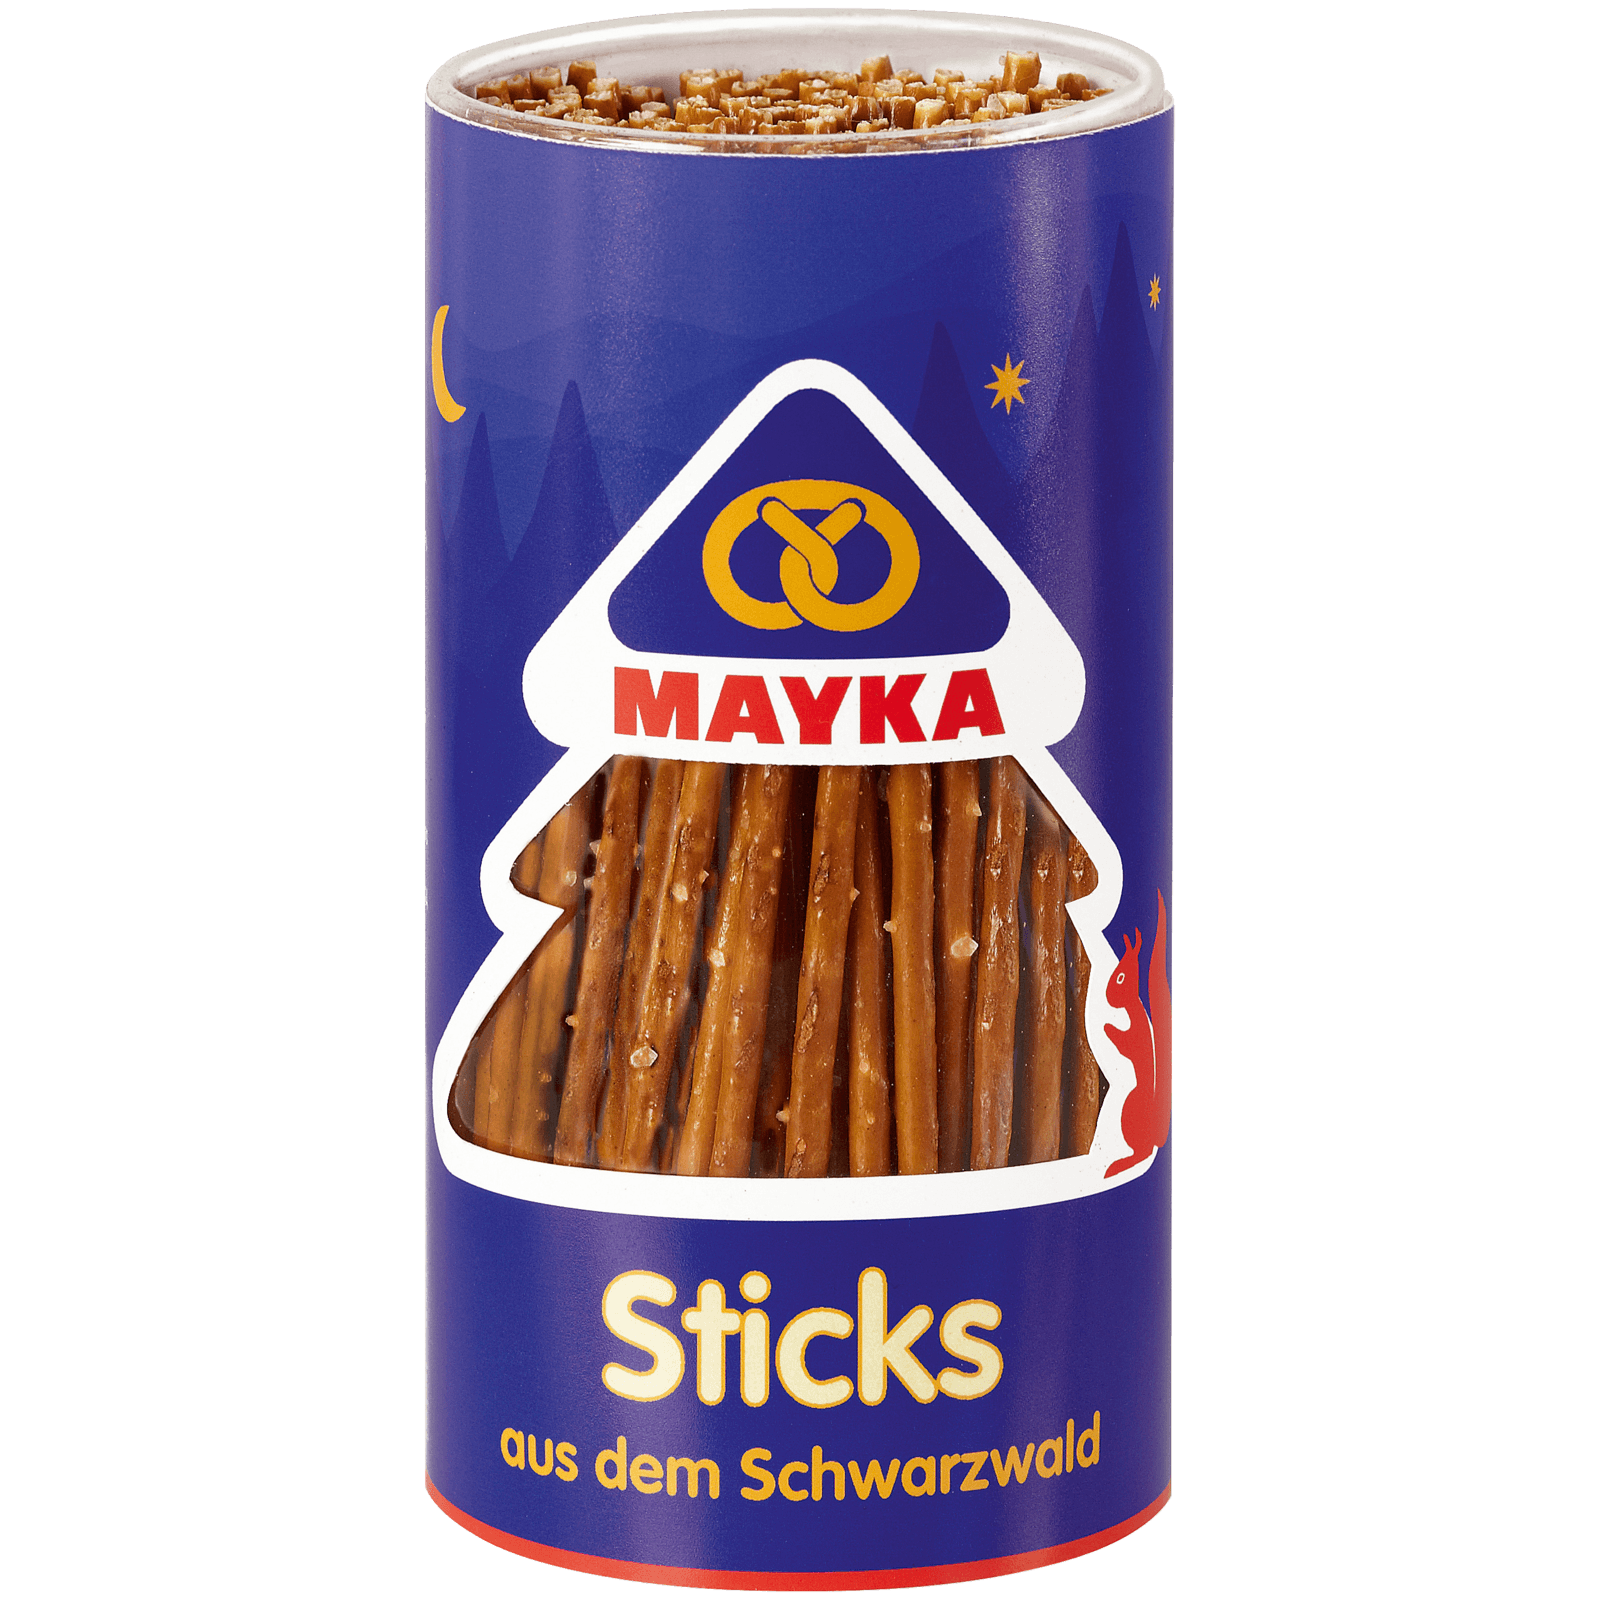 Mayka Sticks 100g